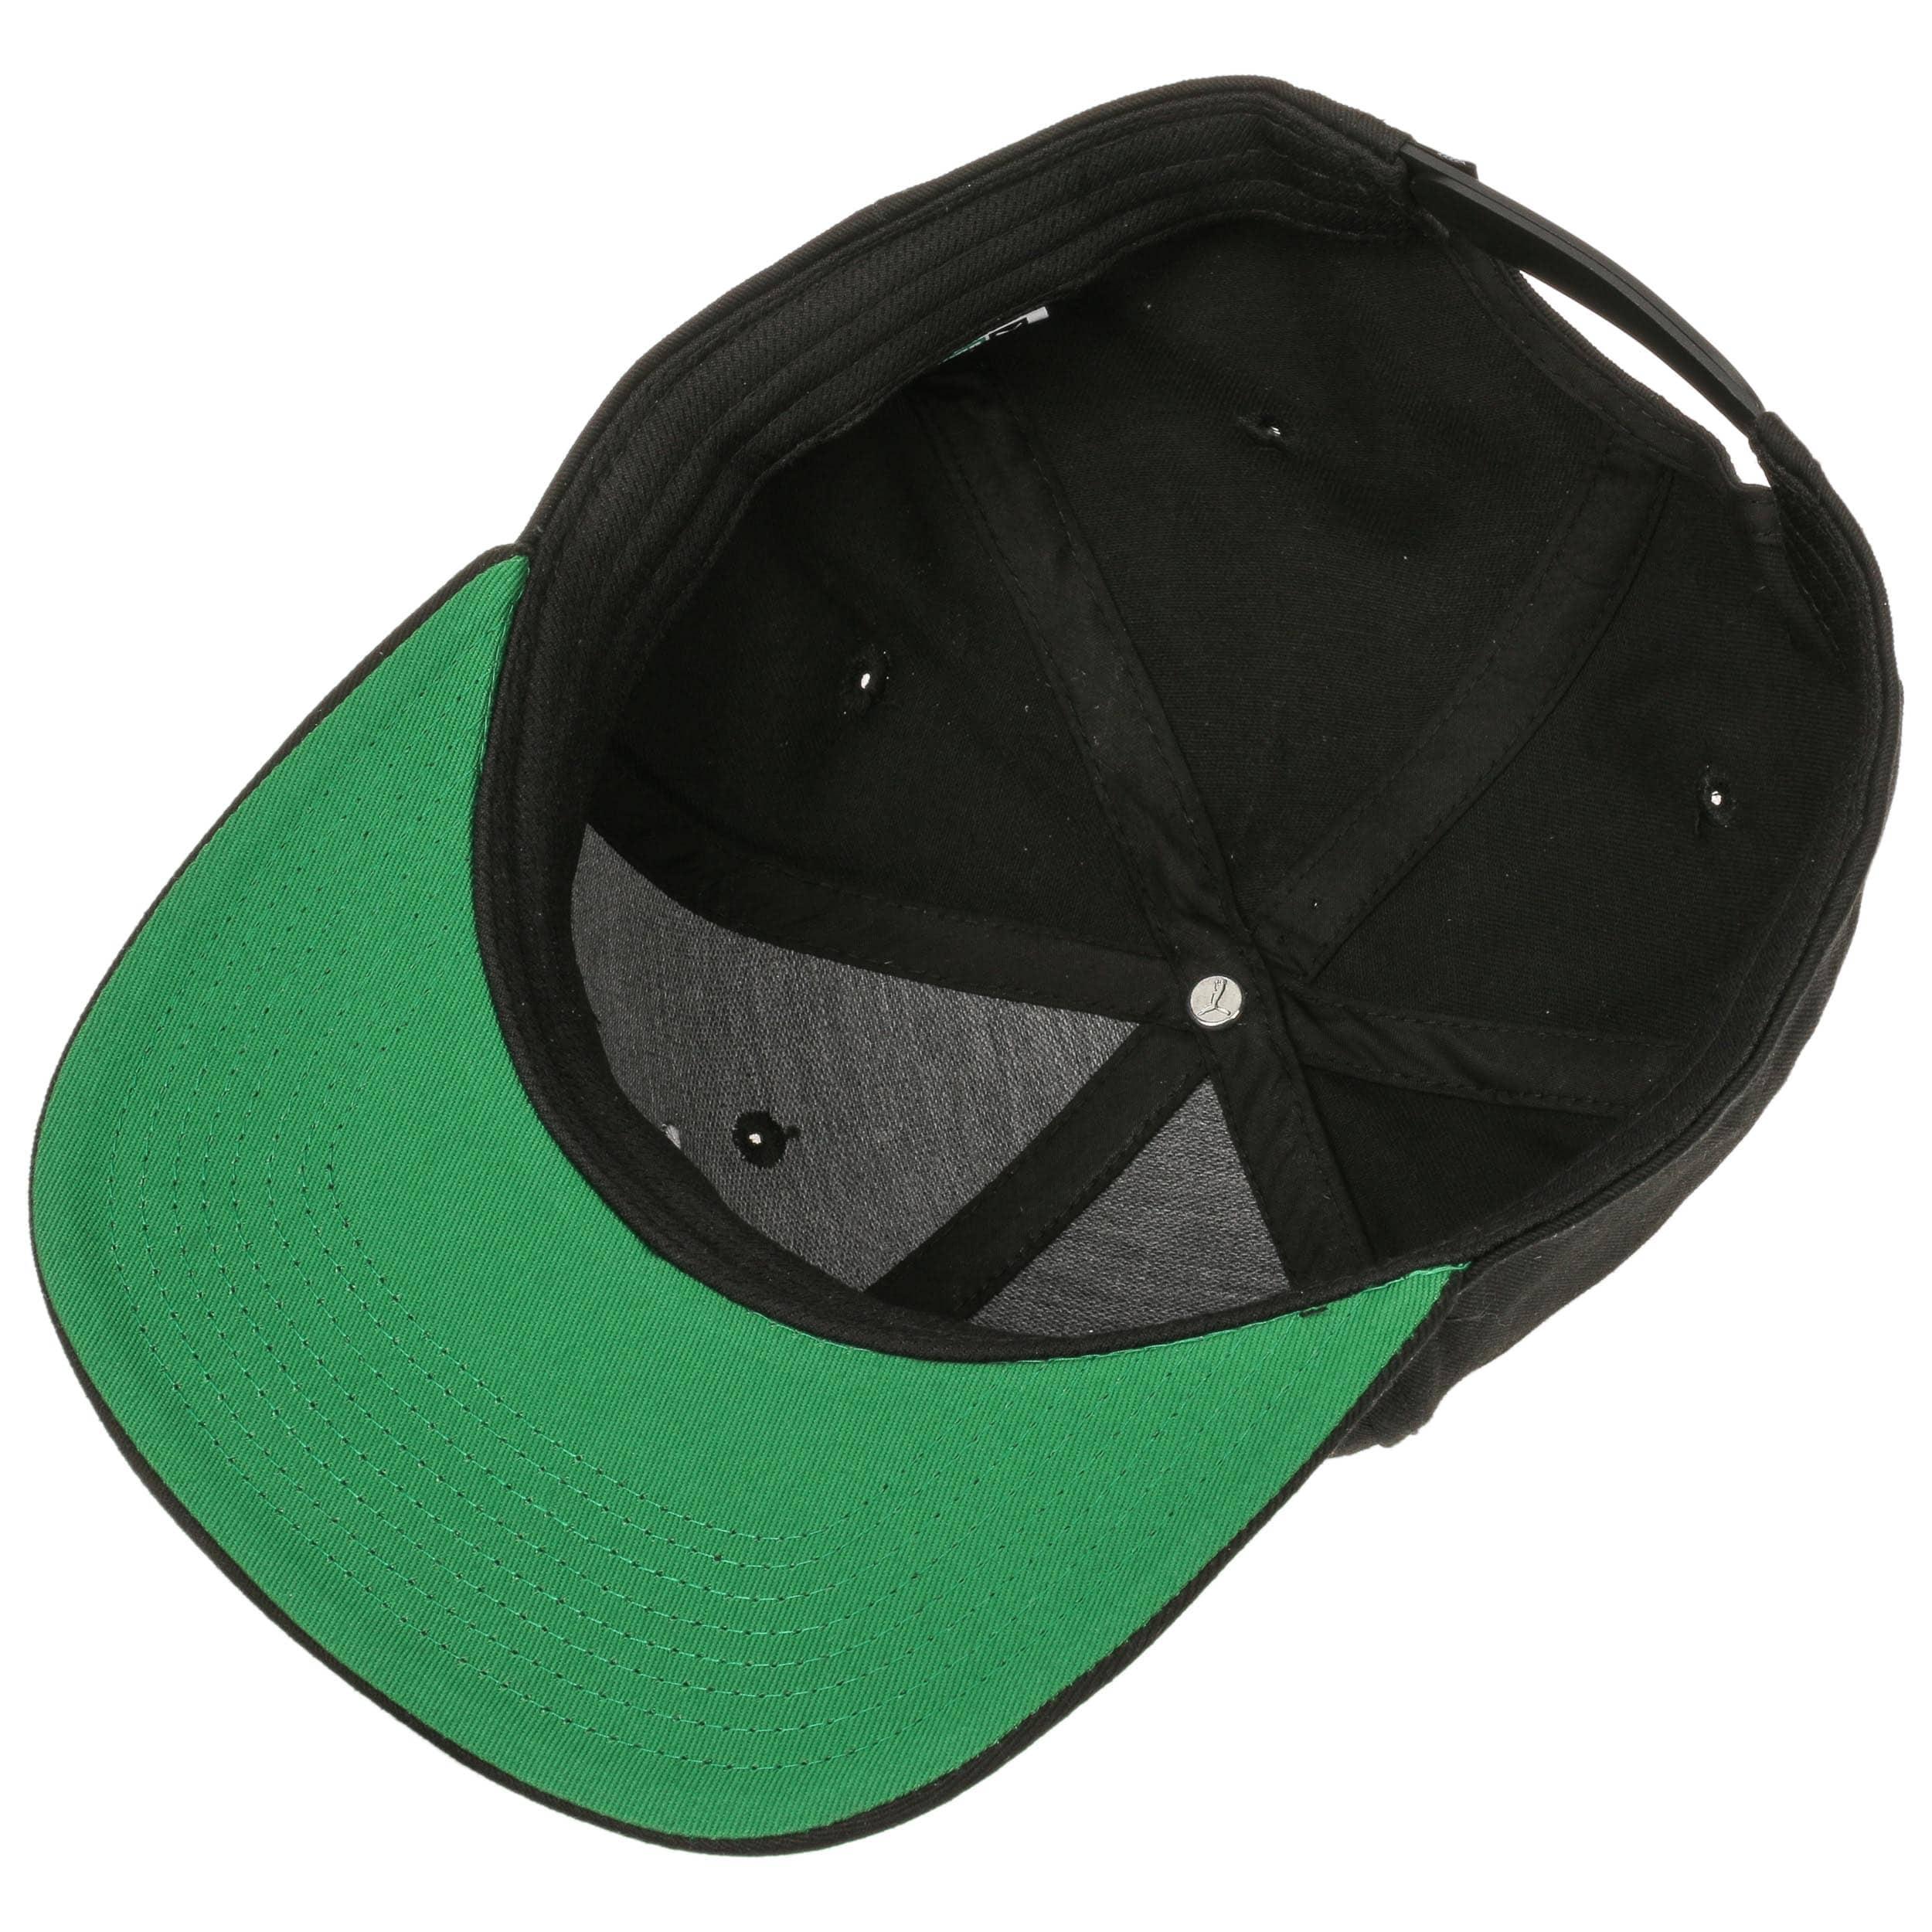 Gorra LS Colour Block Snapback by PUMA - Gorras - sombreroshop.es 810bce9444a